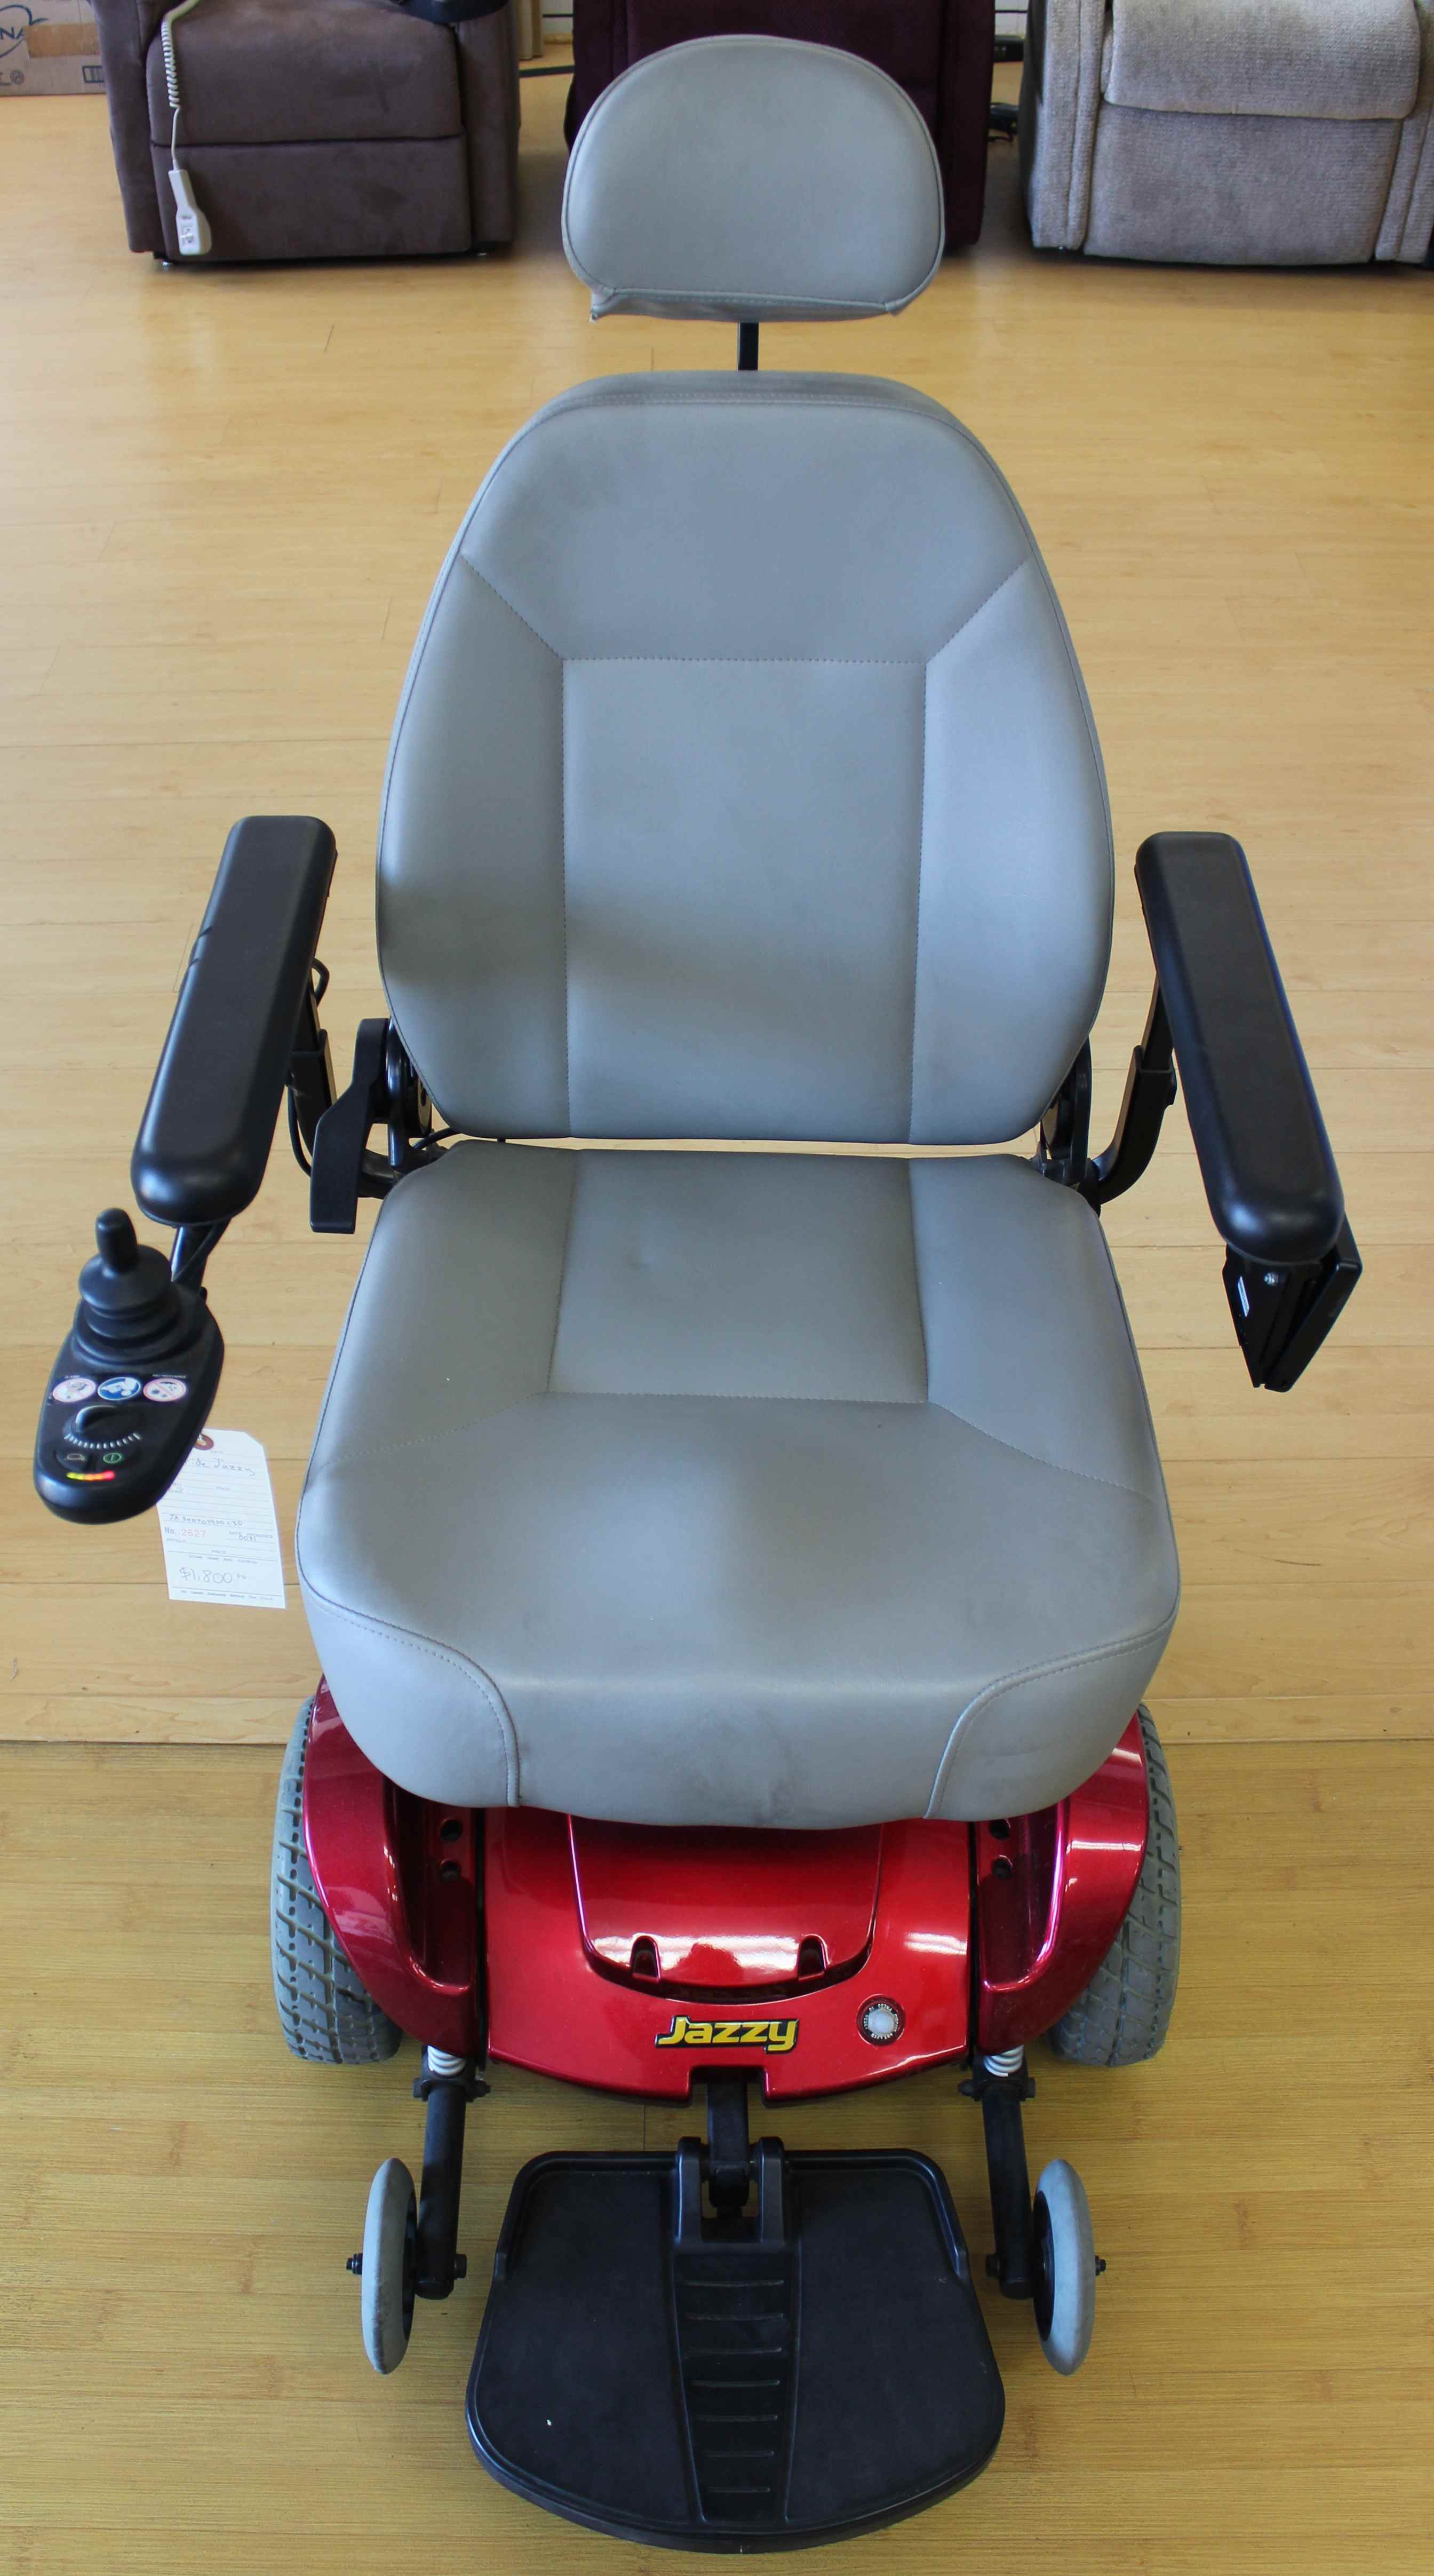 Pride Jazzy Power Wheelchair Rental & Delivery | Los Angeles | South Bay | Long Beach | Palos Verdes | San Pedro | Torrance | Redondo Beach | Manhattan Beach | Carson